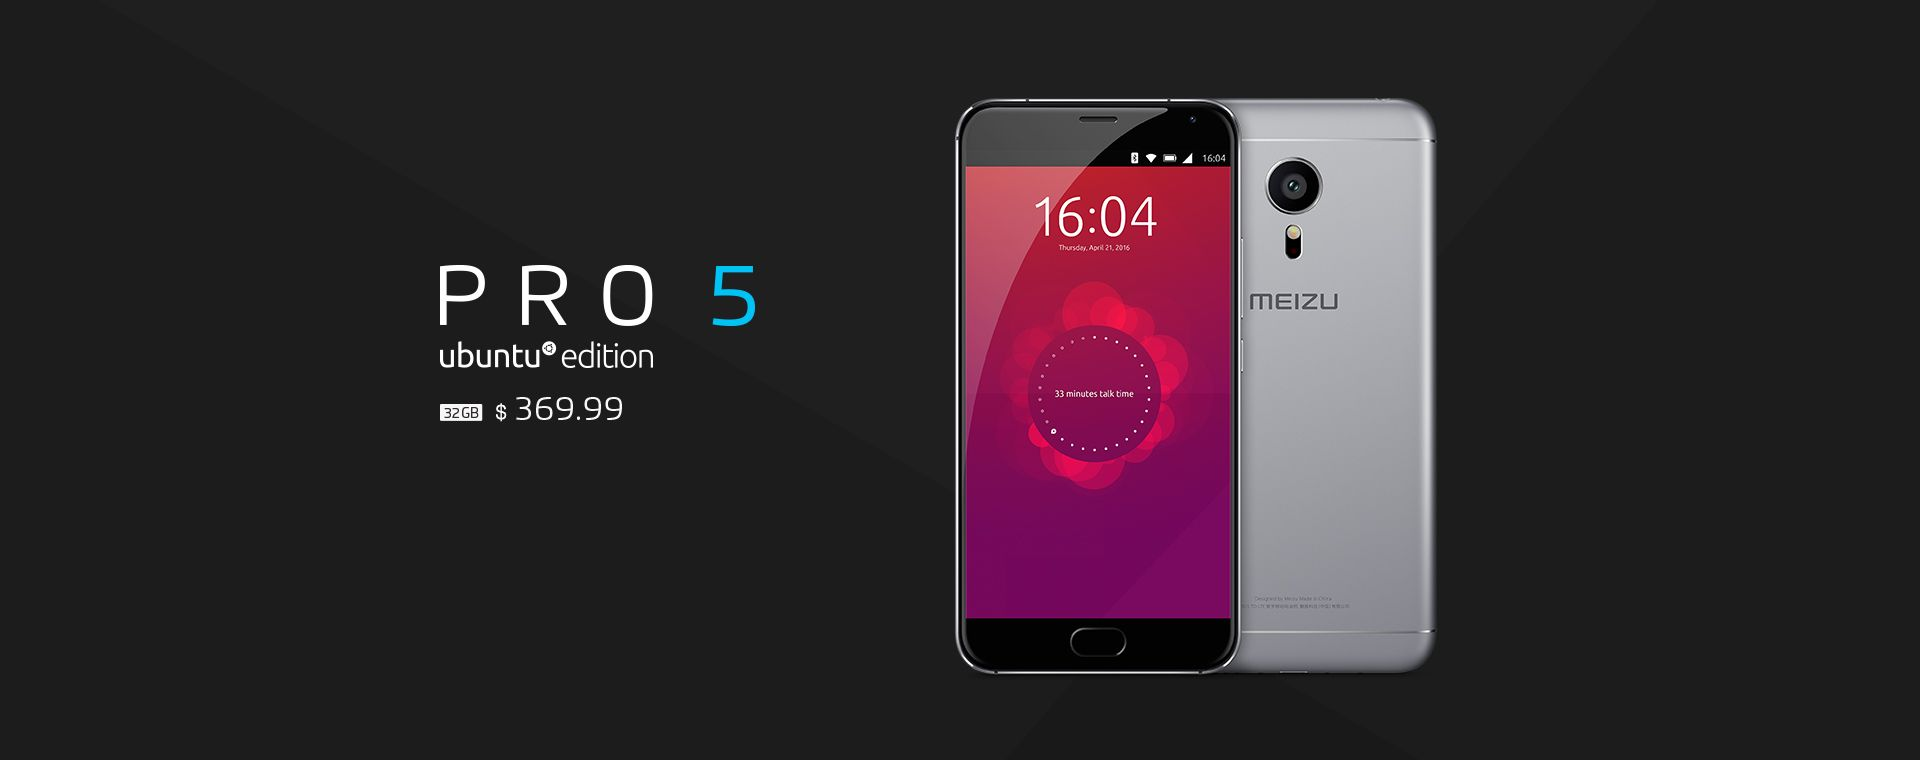 Meizu Pro 5 Ubuntu Editionの価格が公開。32GBモデルのみで$369.99